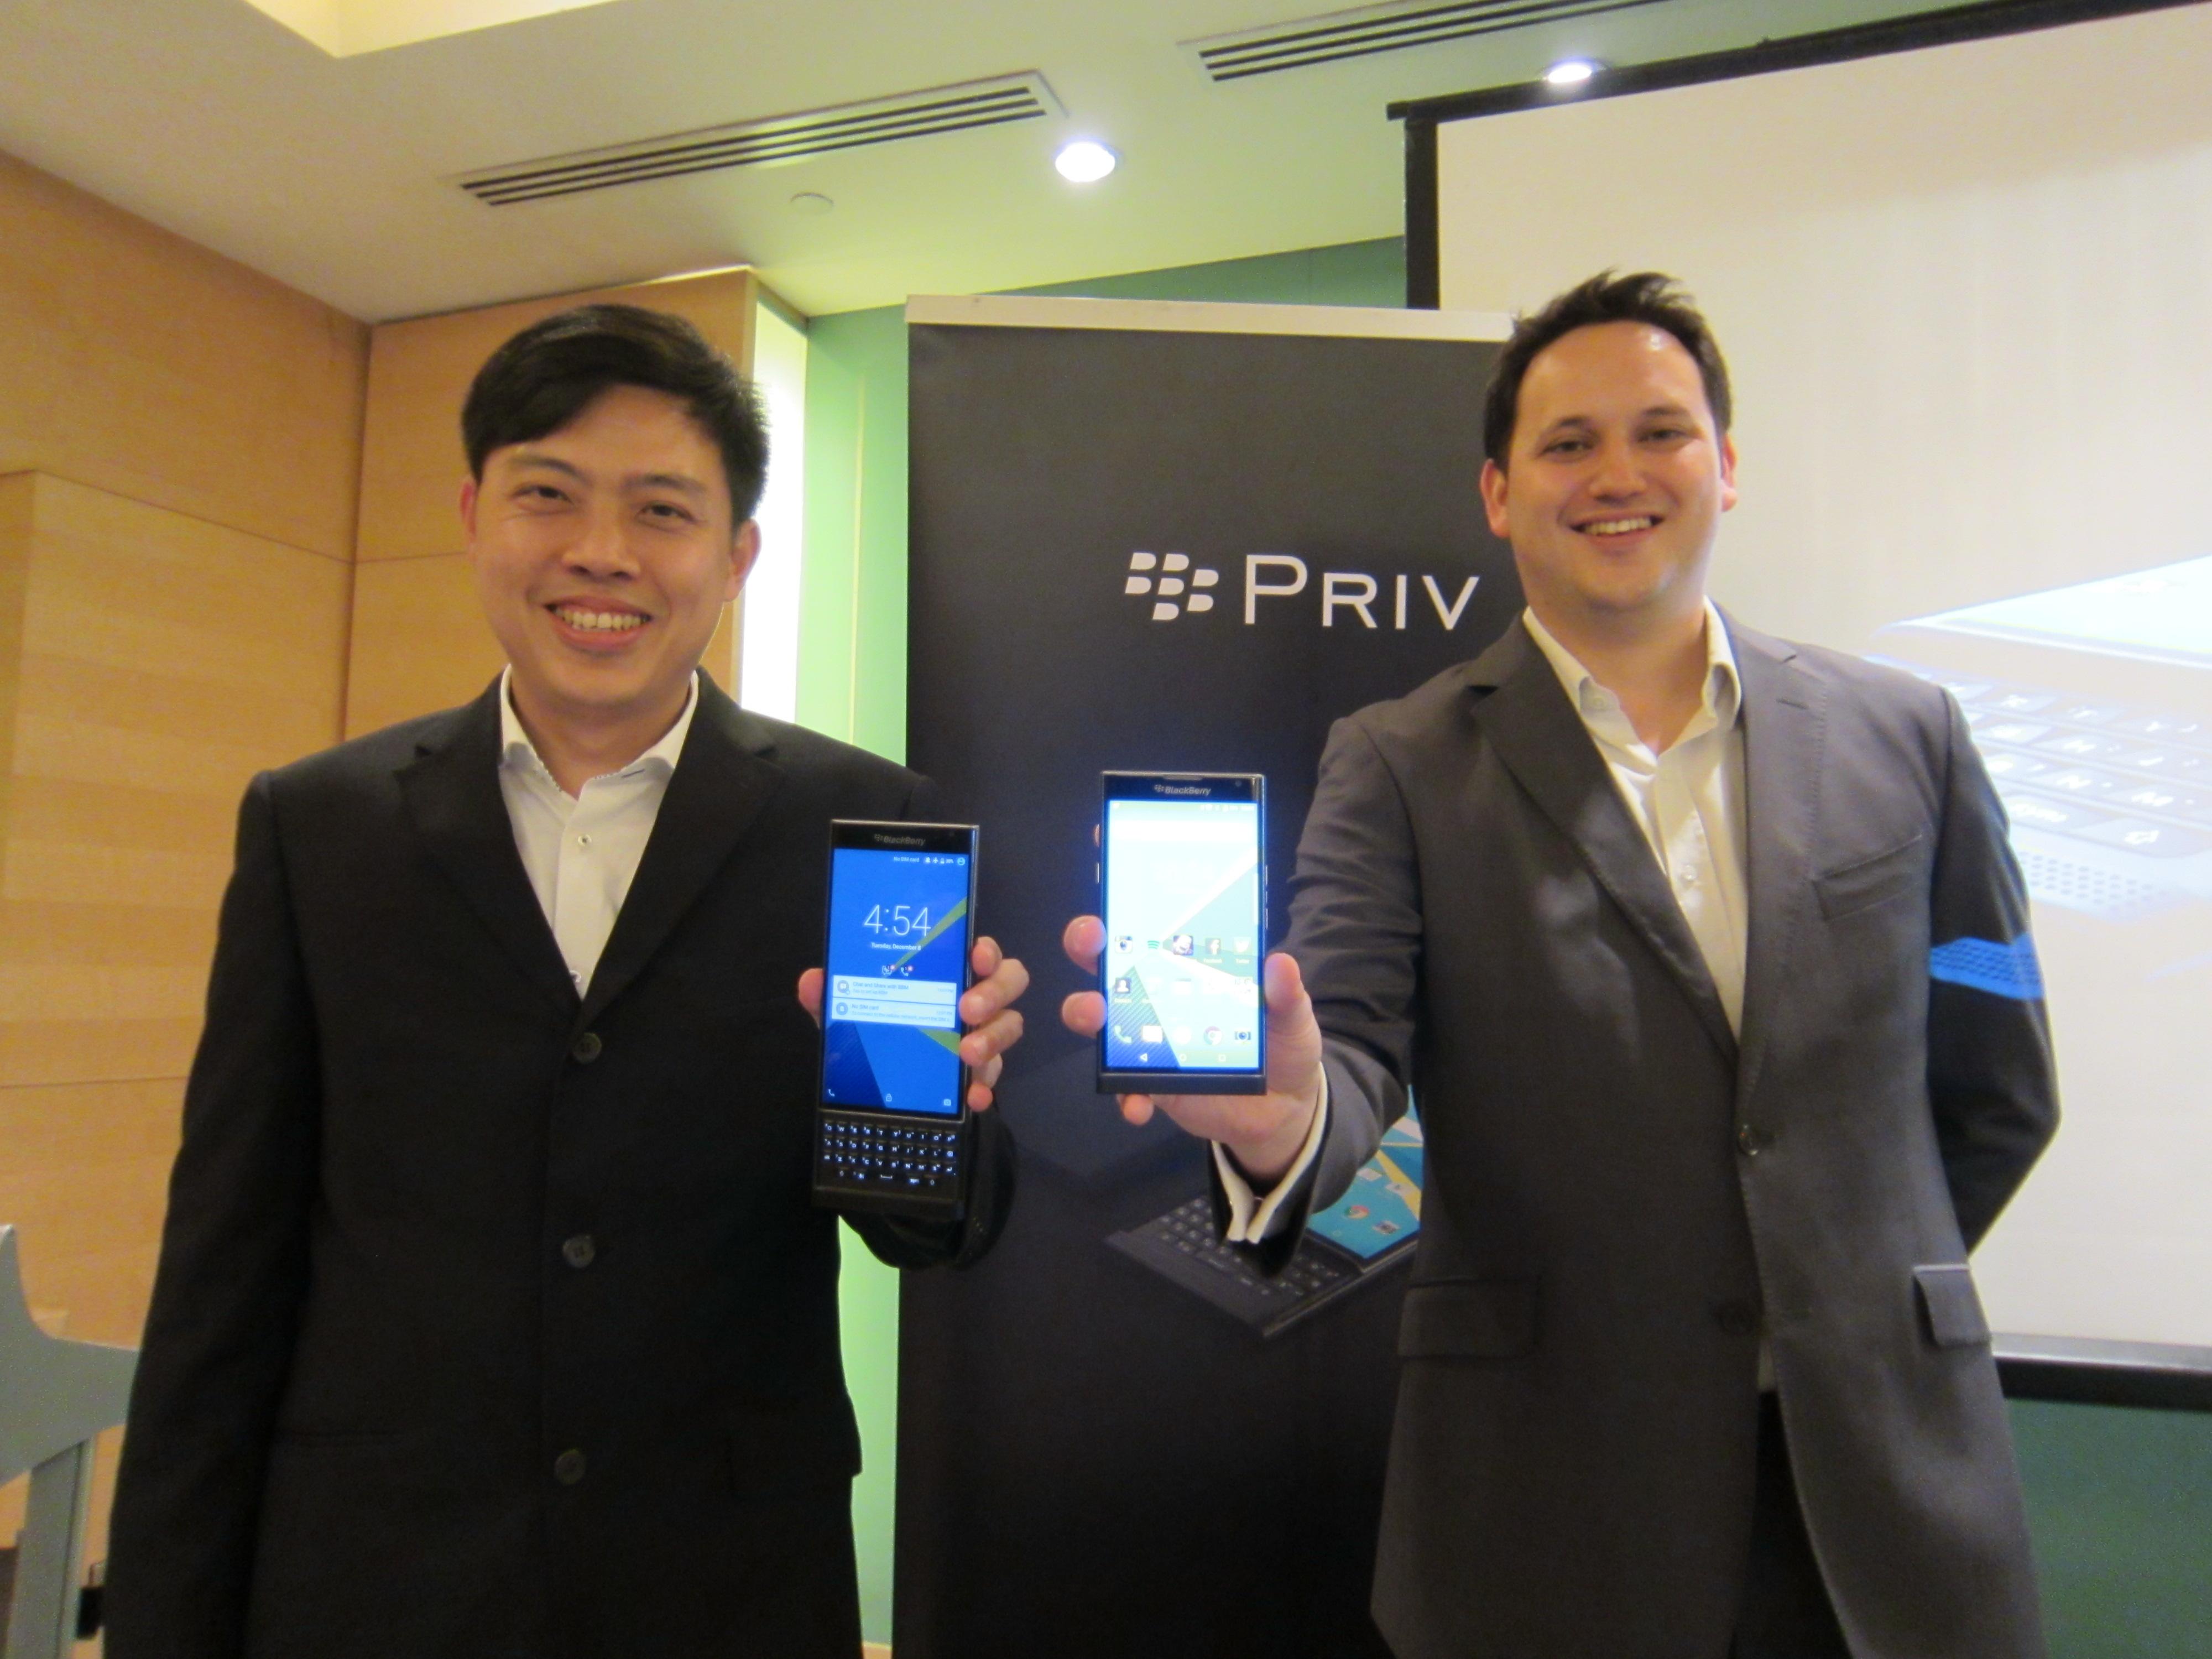 BlackBerry PRIV Launch